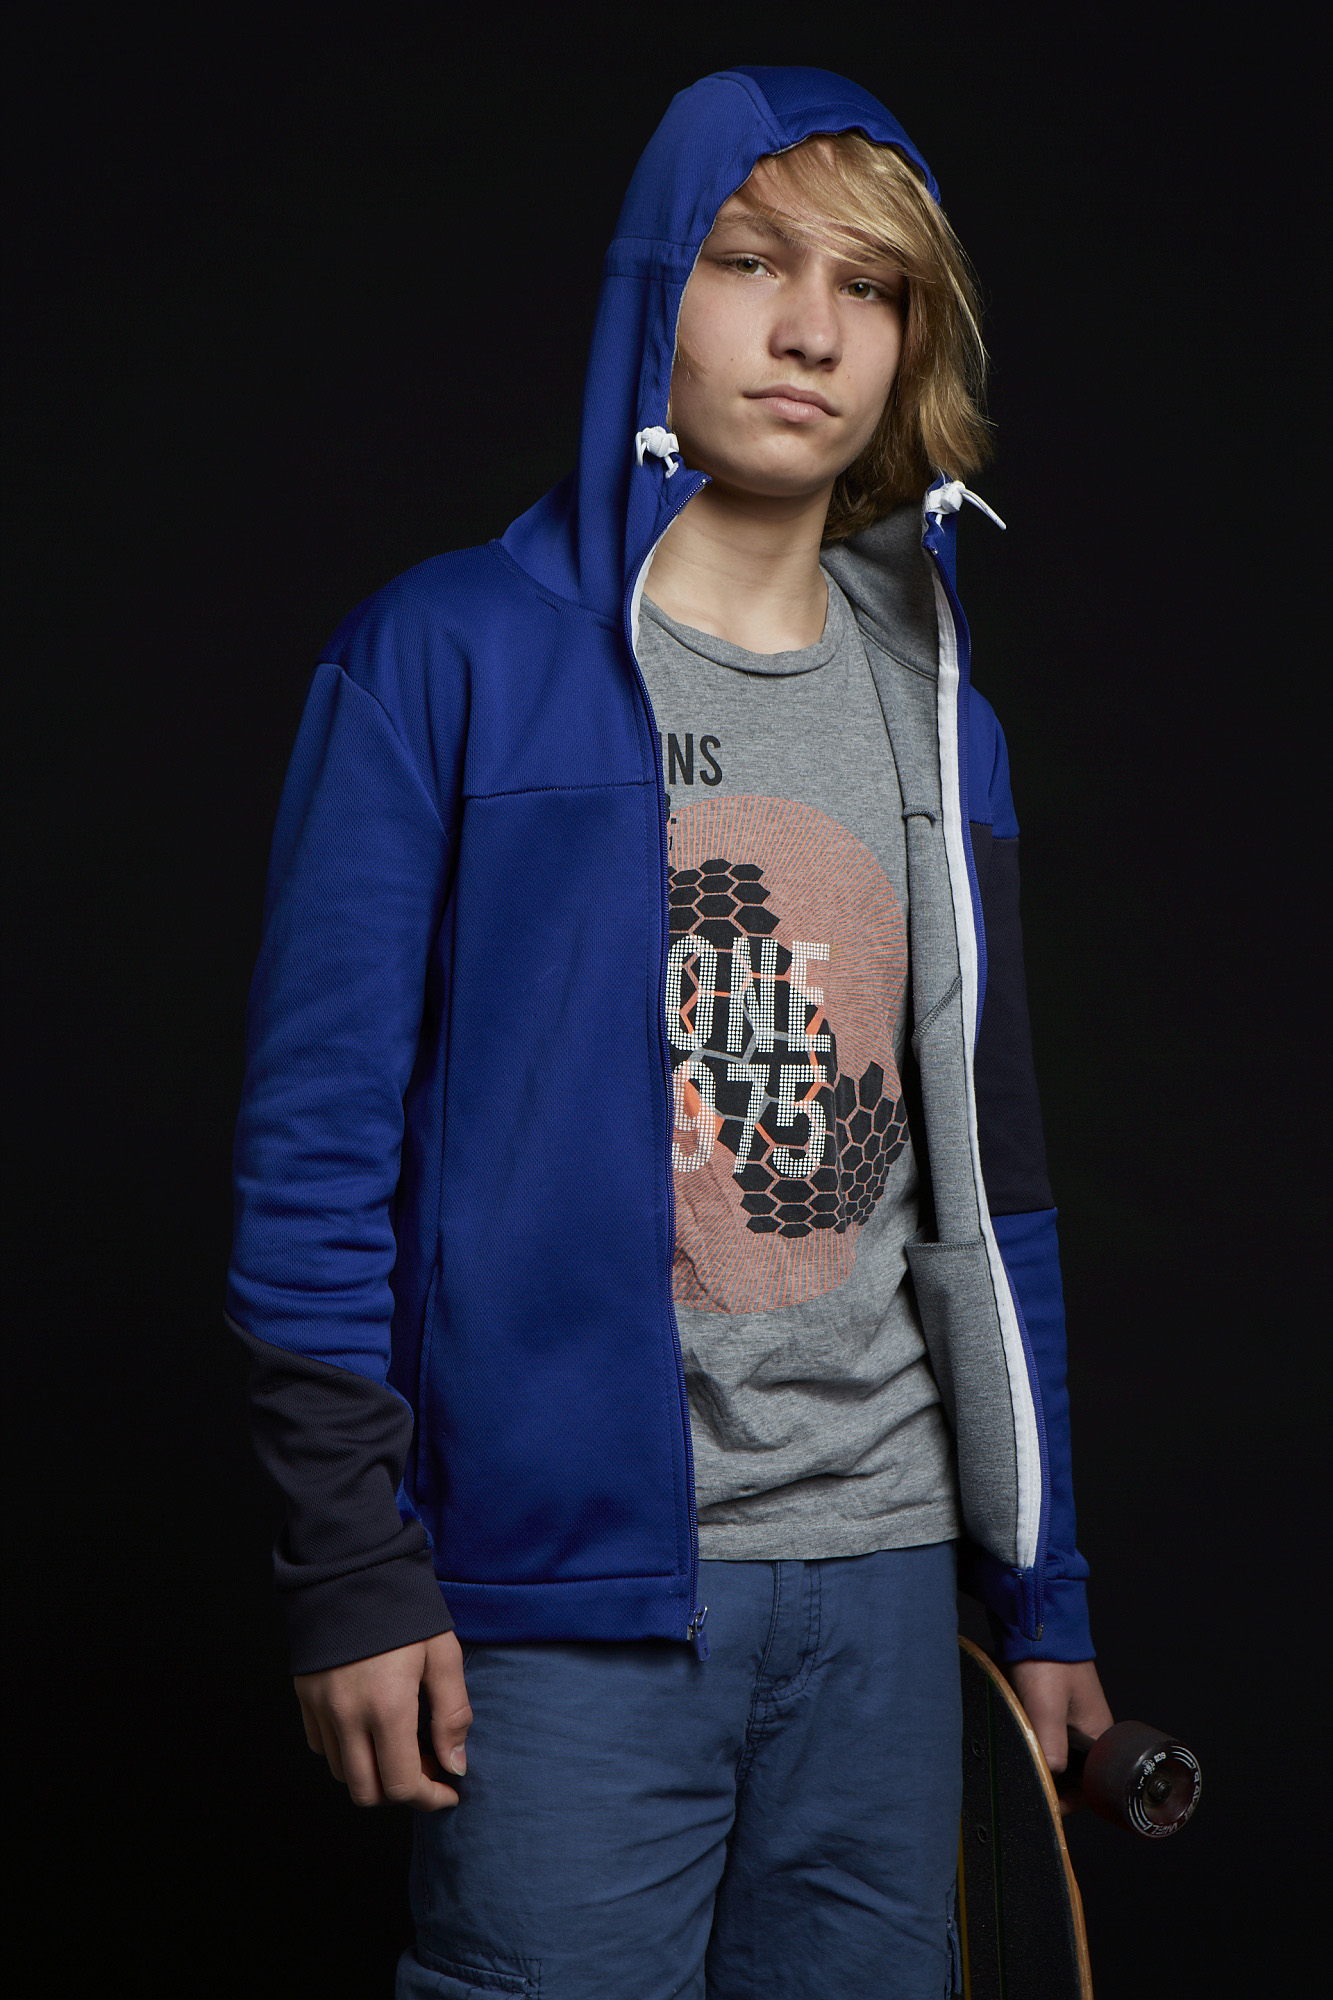 Grant Riordon as Boy